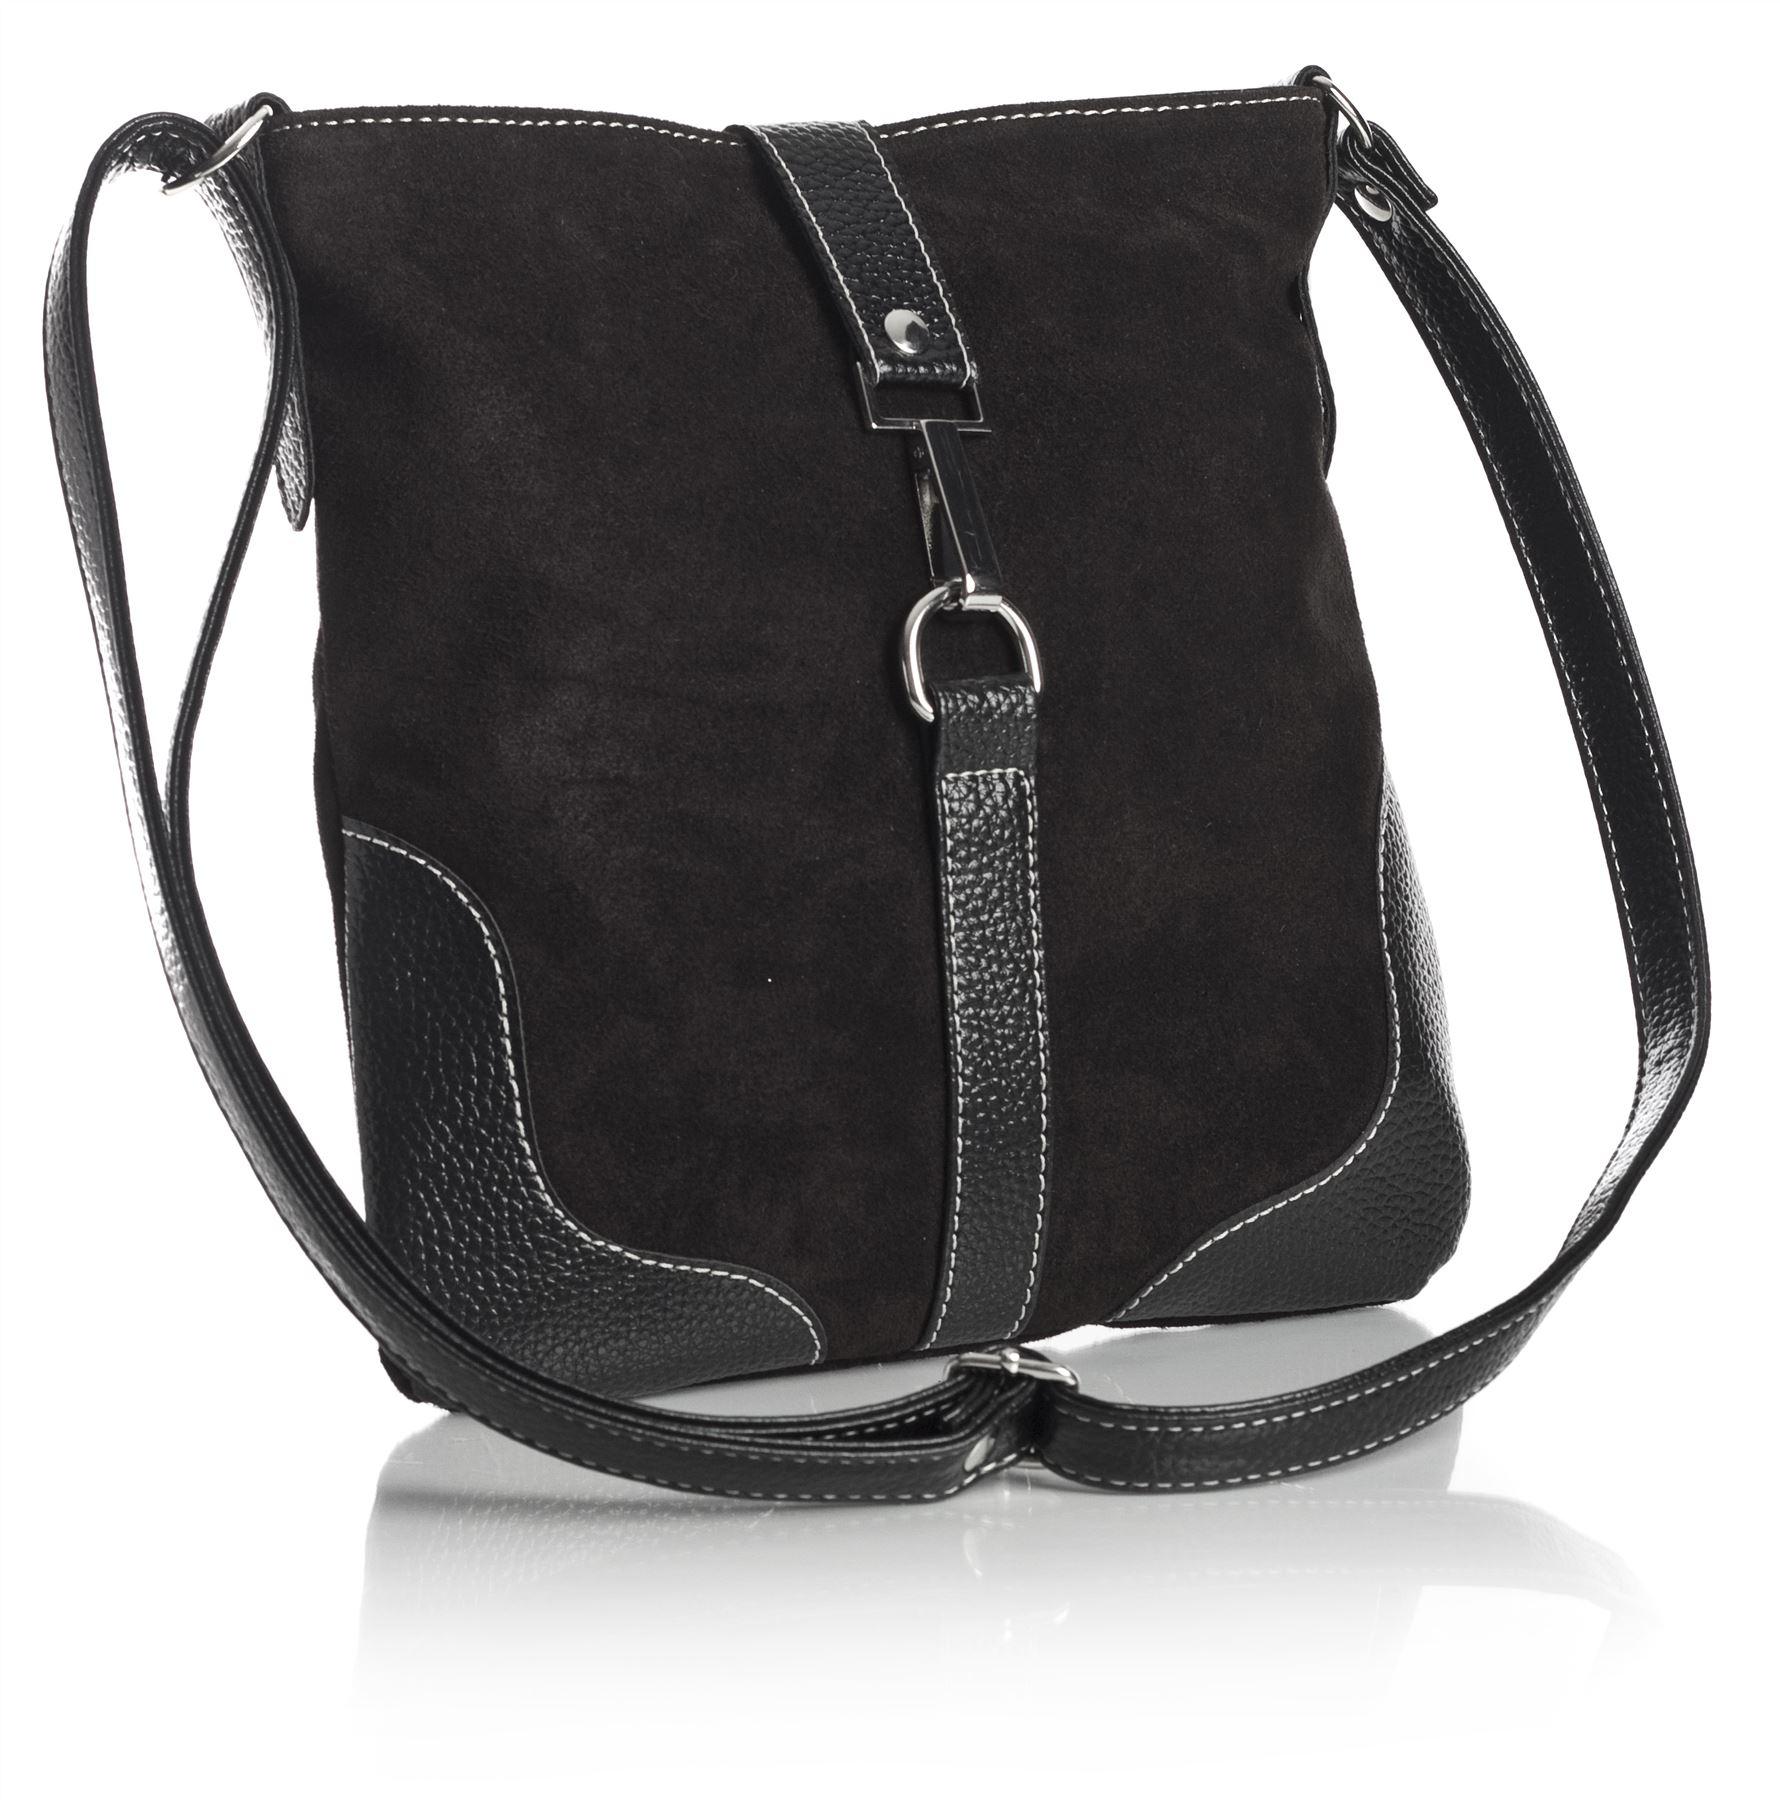 7 Crossbody Bag Patterns to Sew  Dog Walking Bag Cross Body